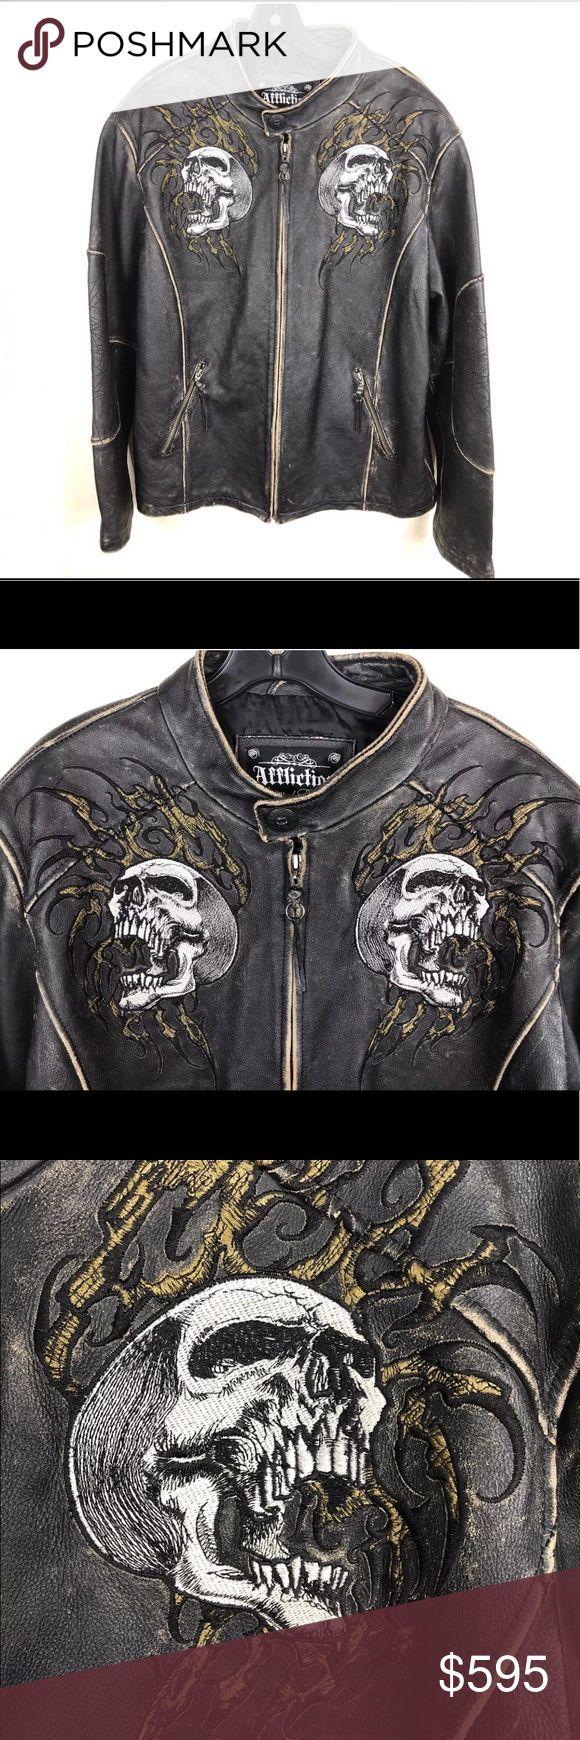 Affliction Shredded Leather Jacket Skulls XL Leather